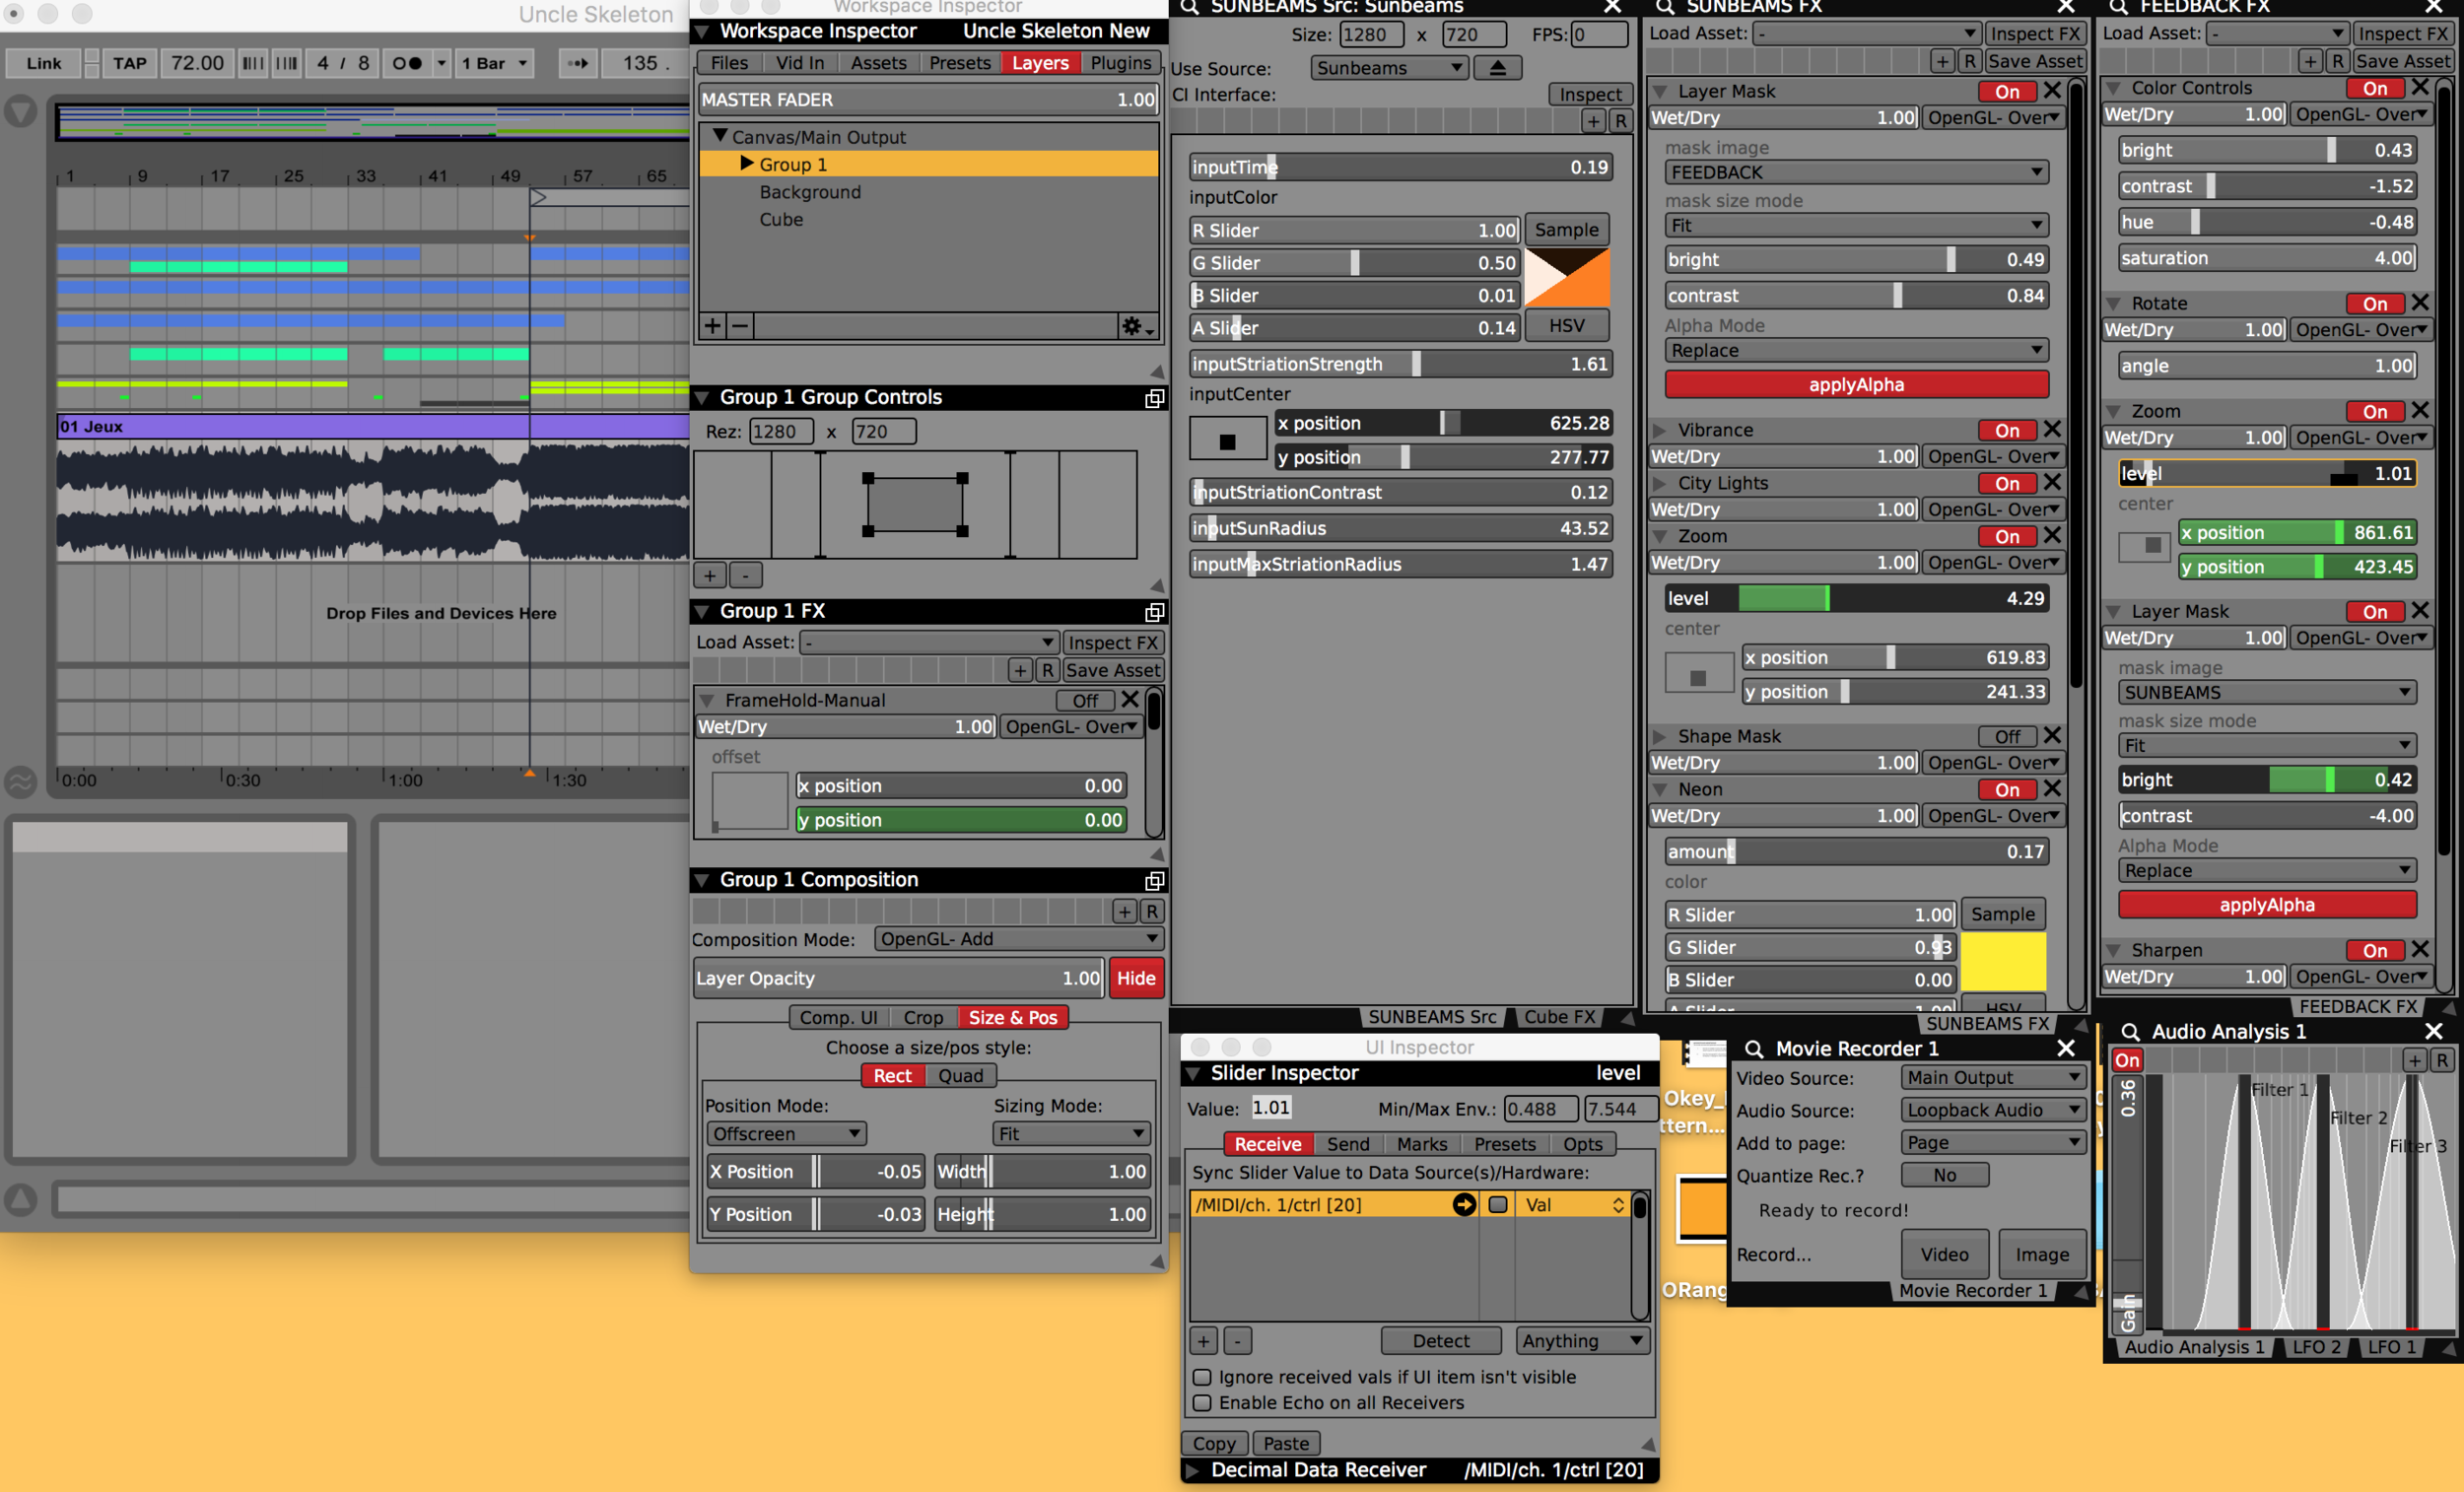 VDMX Setup for making Jeux music video